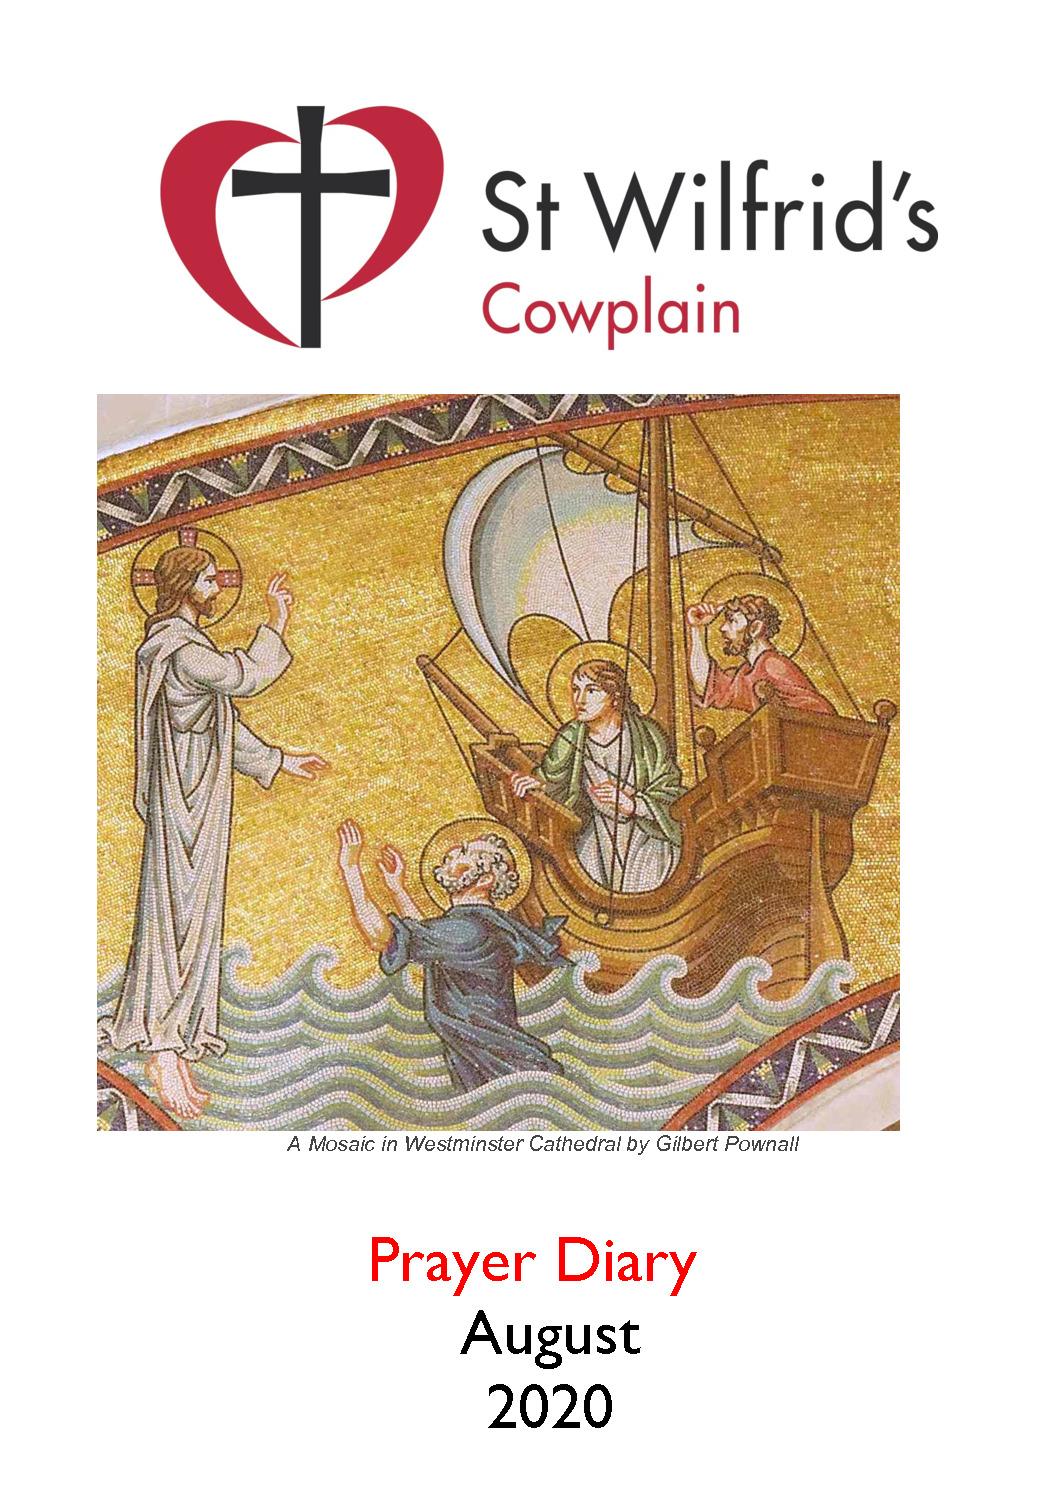 thumbnail of Prayer Diary August 2020